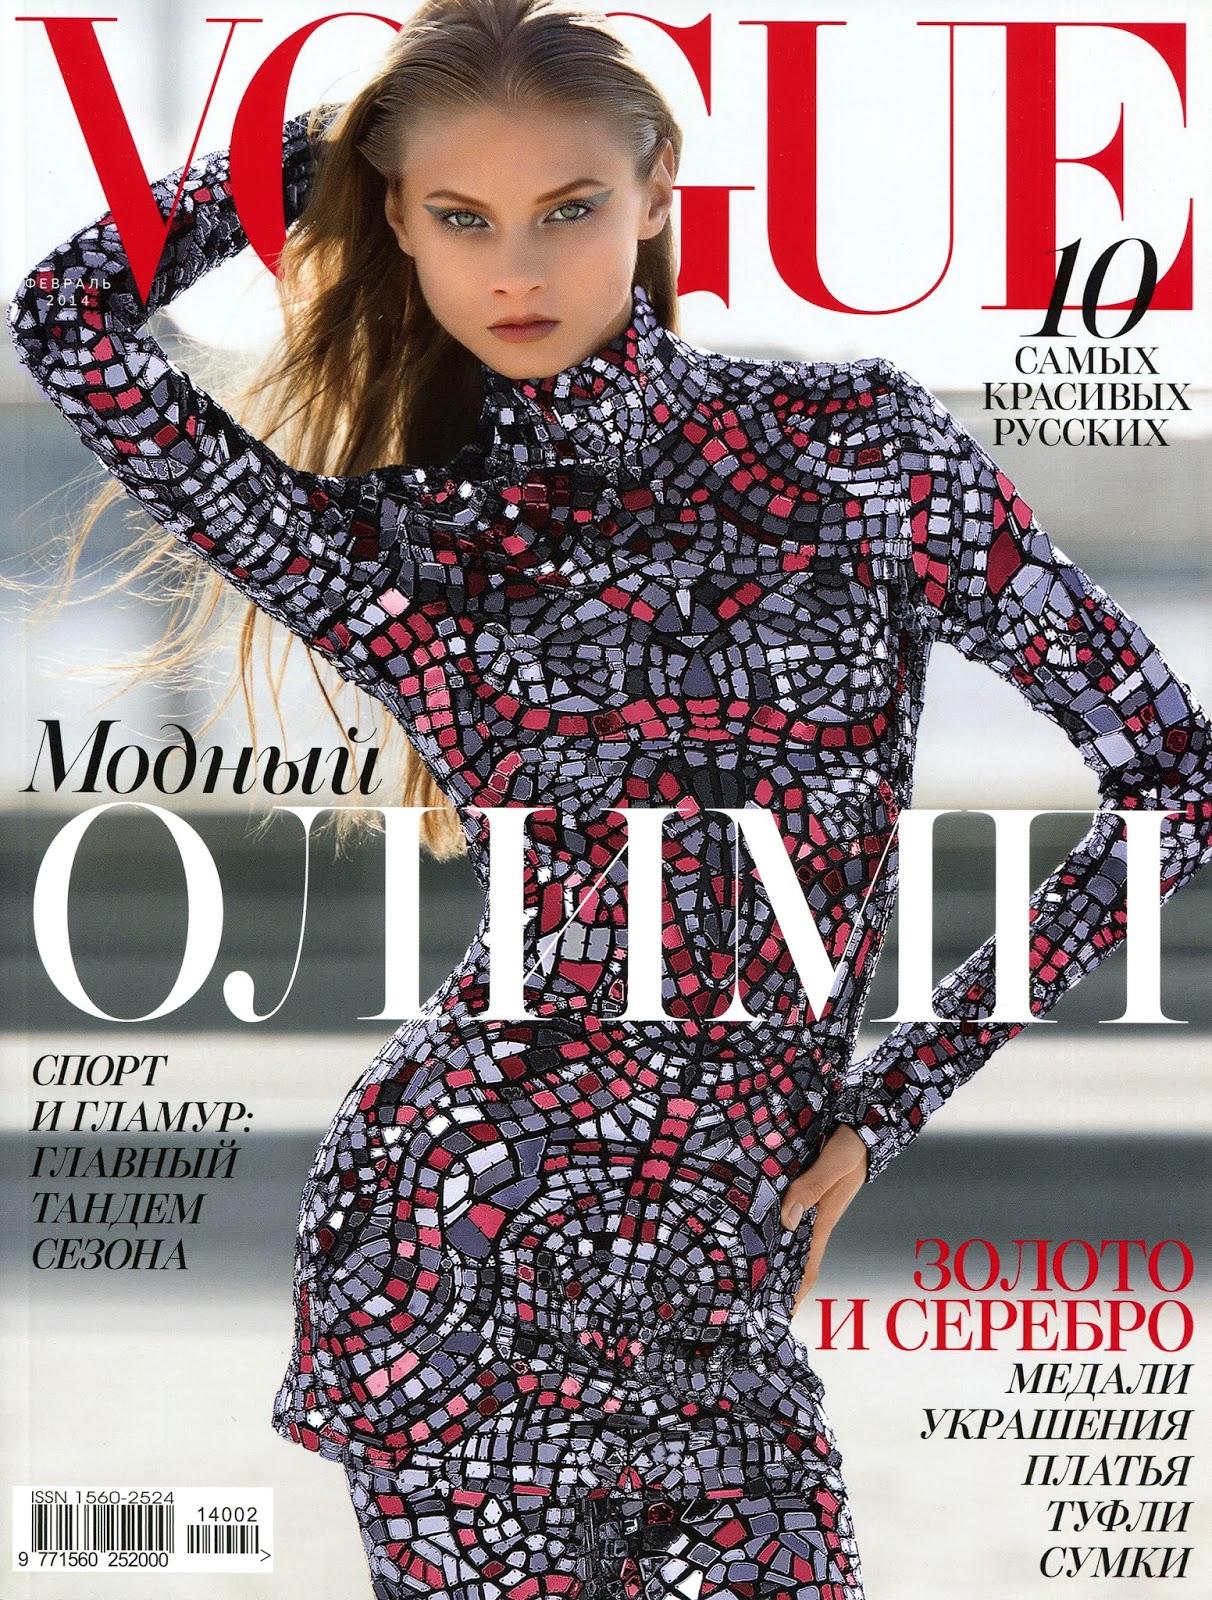 Magazine Cover : Anna Selezneva Magazine Photoshoot Pics on Vogue Magazine Russia February 2014 Issue